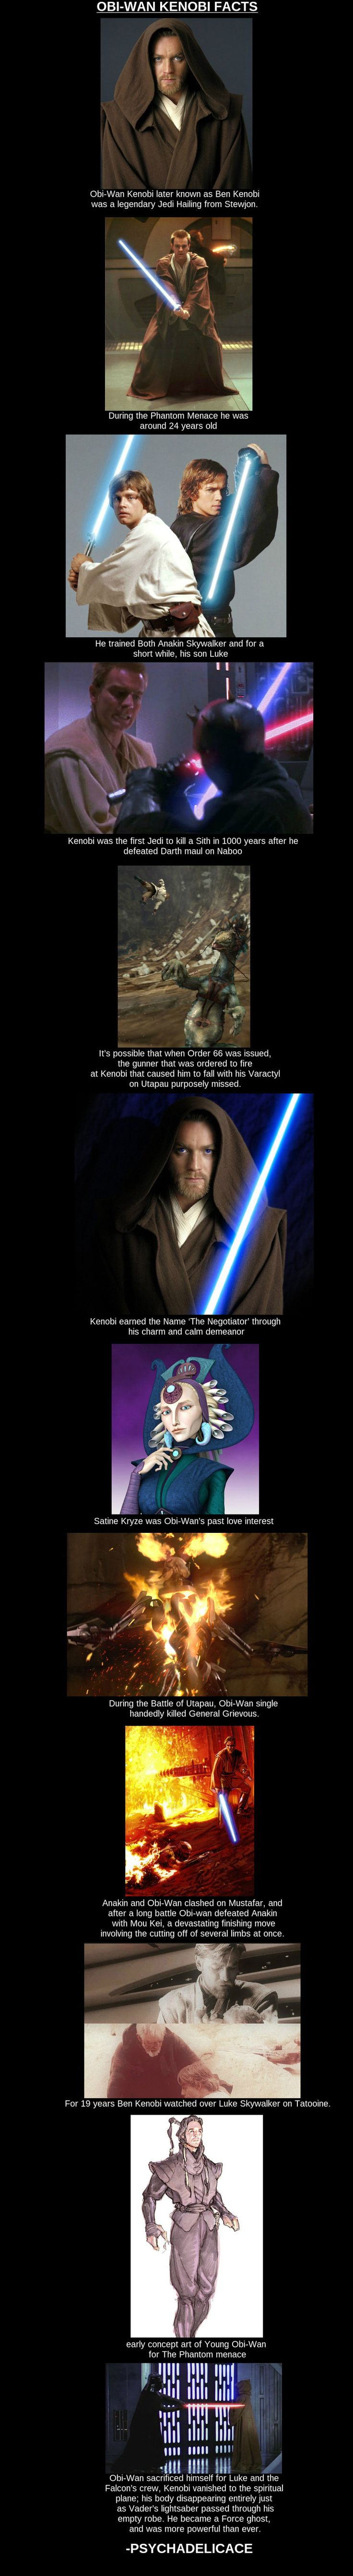 Obi-Wan Kenobi this si really good for poster material!